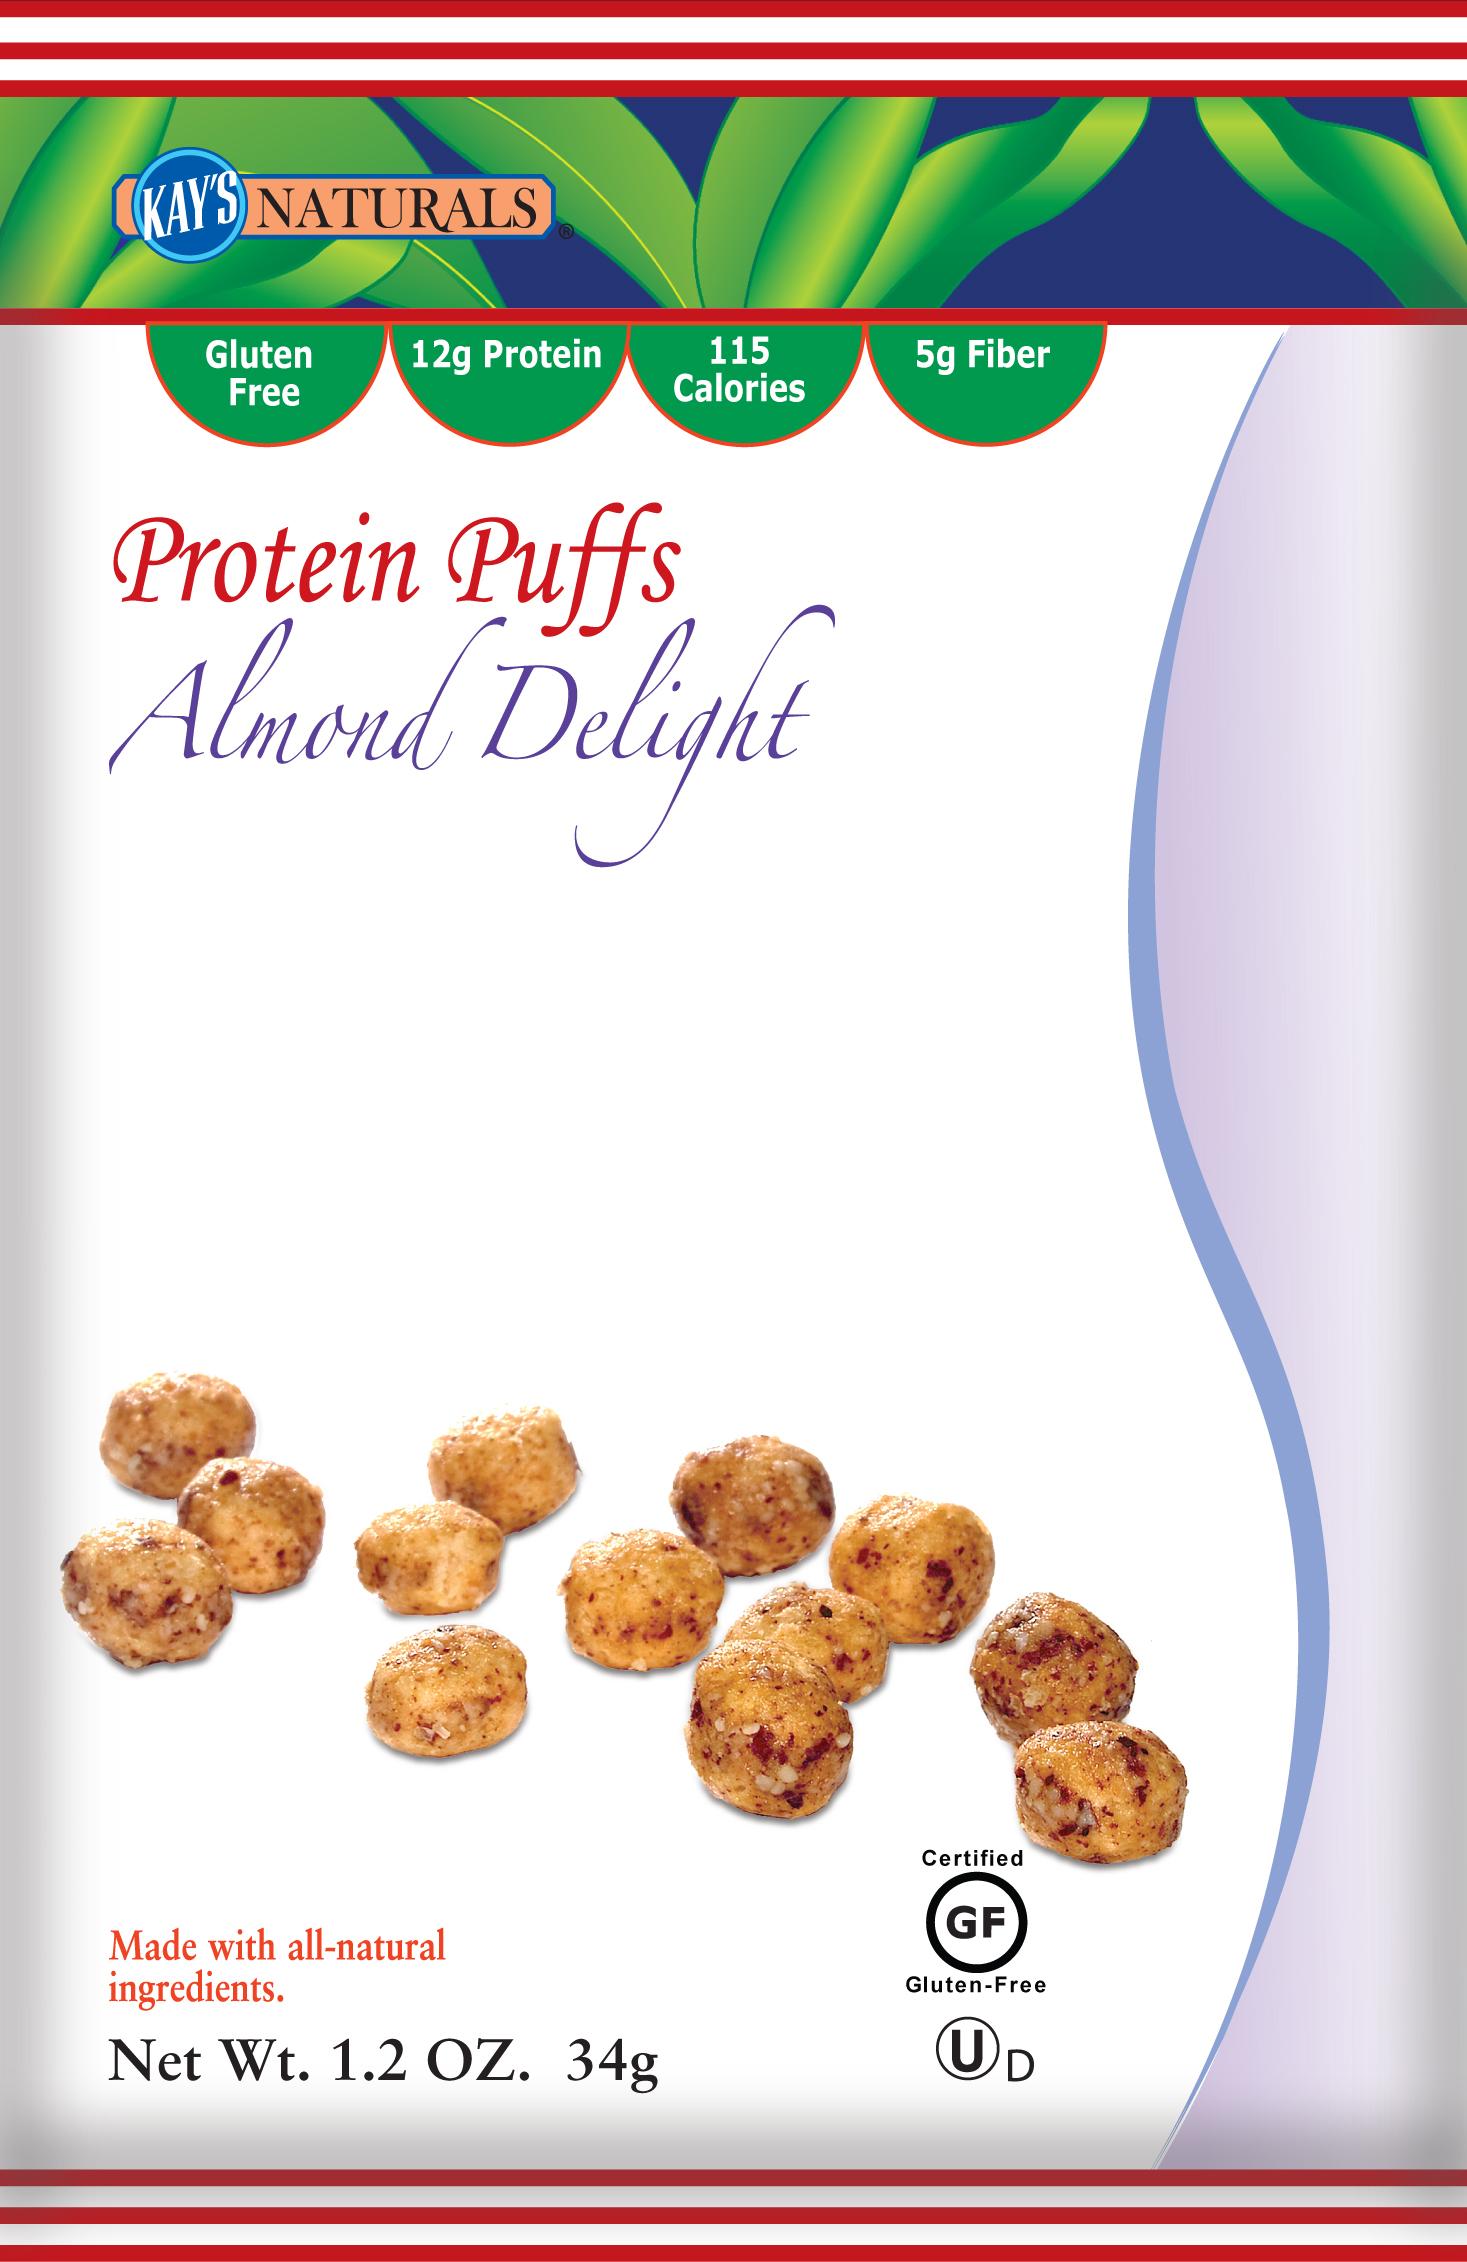 Kays Naturals Protein Puffs Almond Delight